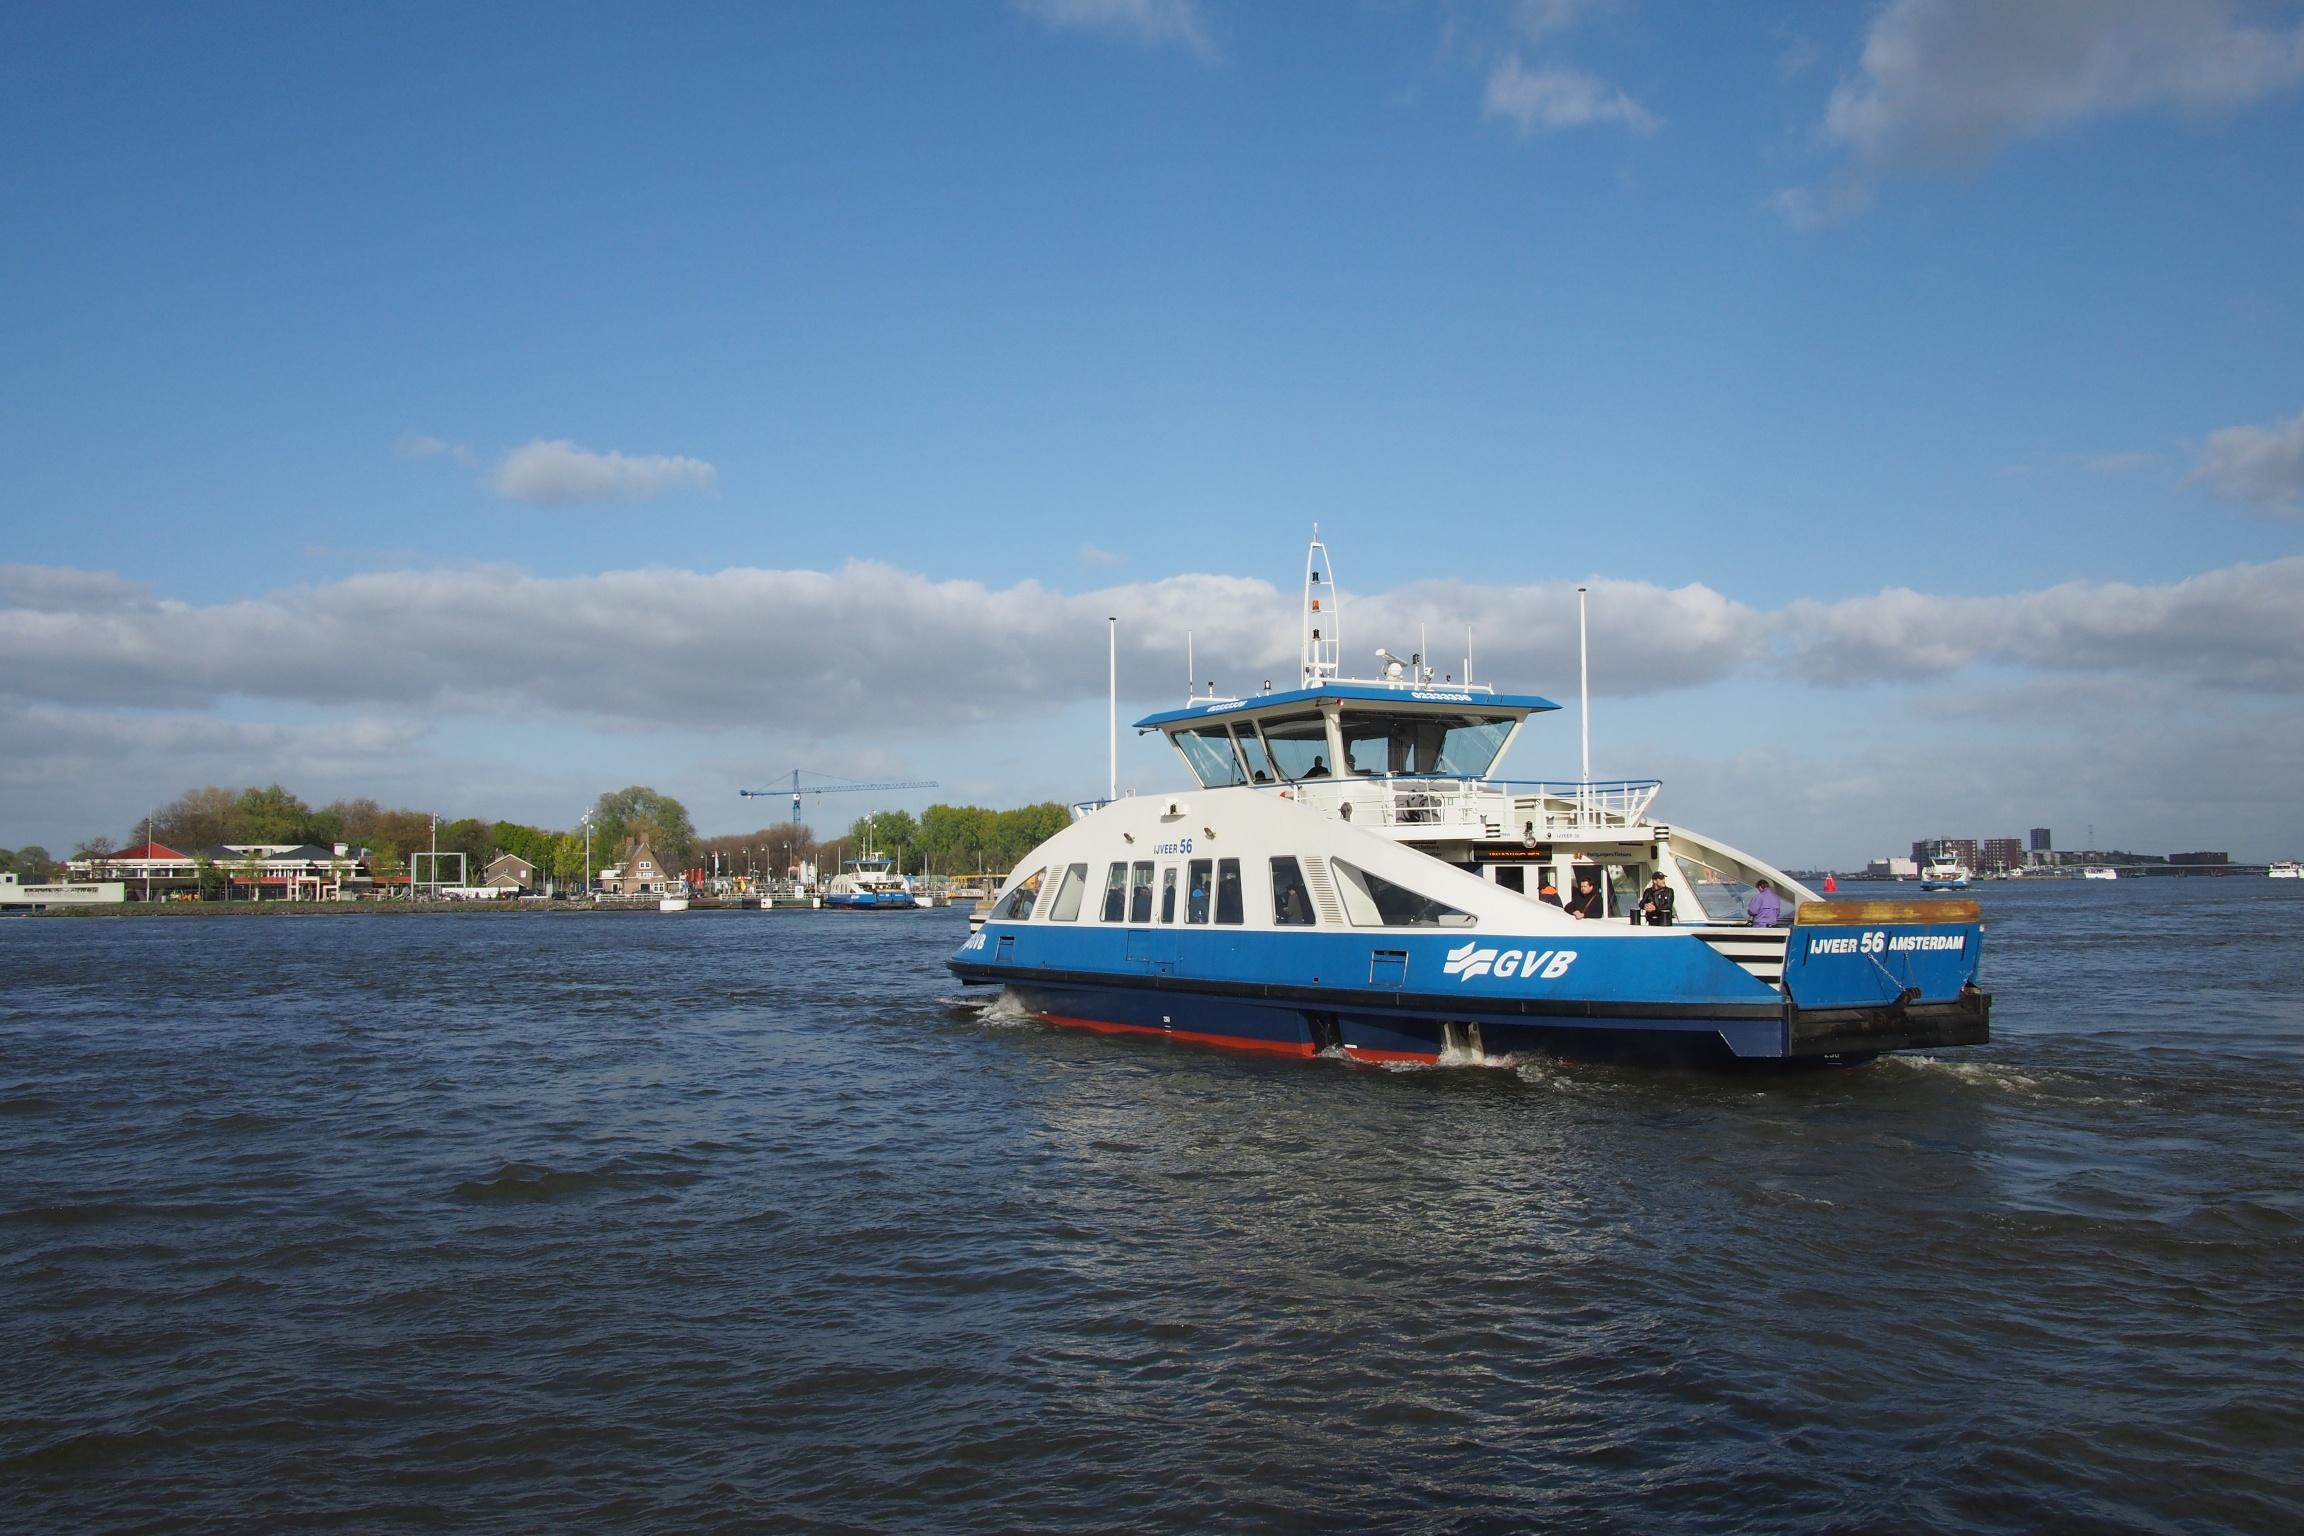 Ferry ride across the IJ River: stock photo taken from Google